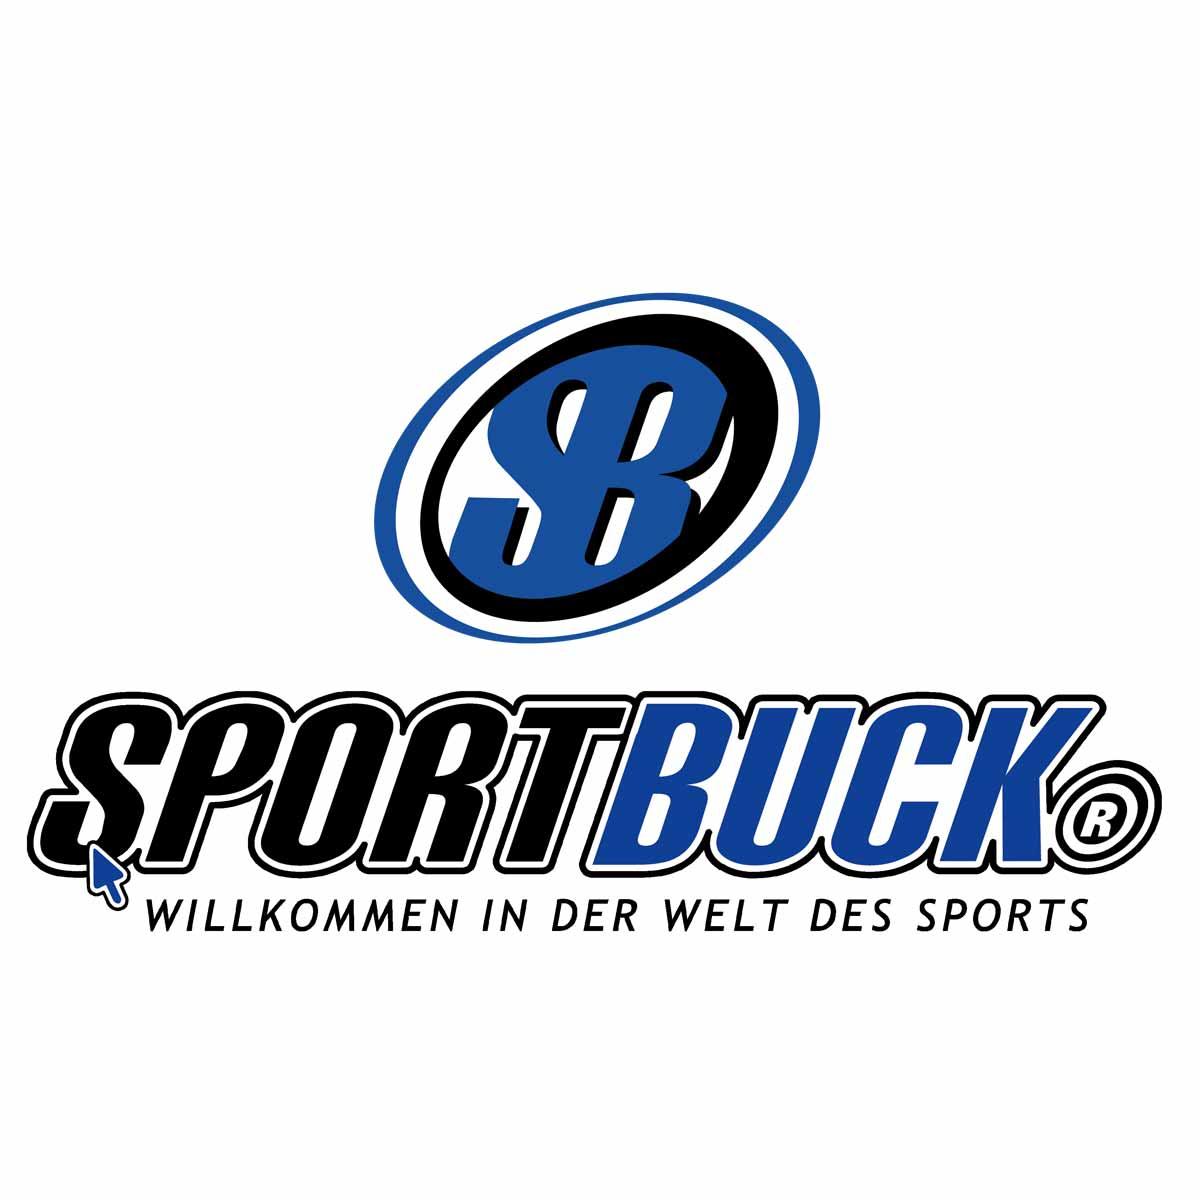 Whey 94 Isolate Molkenproteinisolat Eiweißpulver 425g Schokolade - Mindesthaltbarkeitsdatum 08/2022